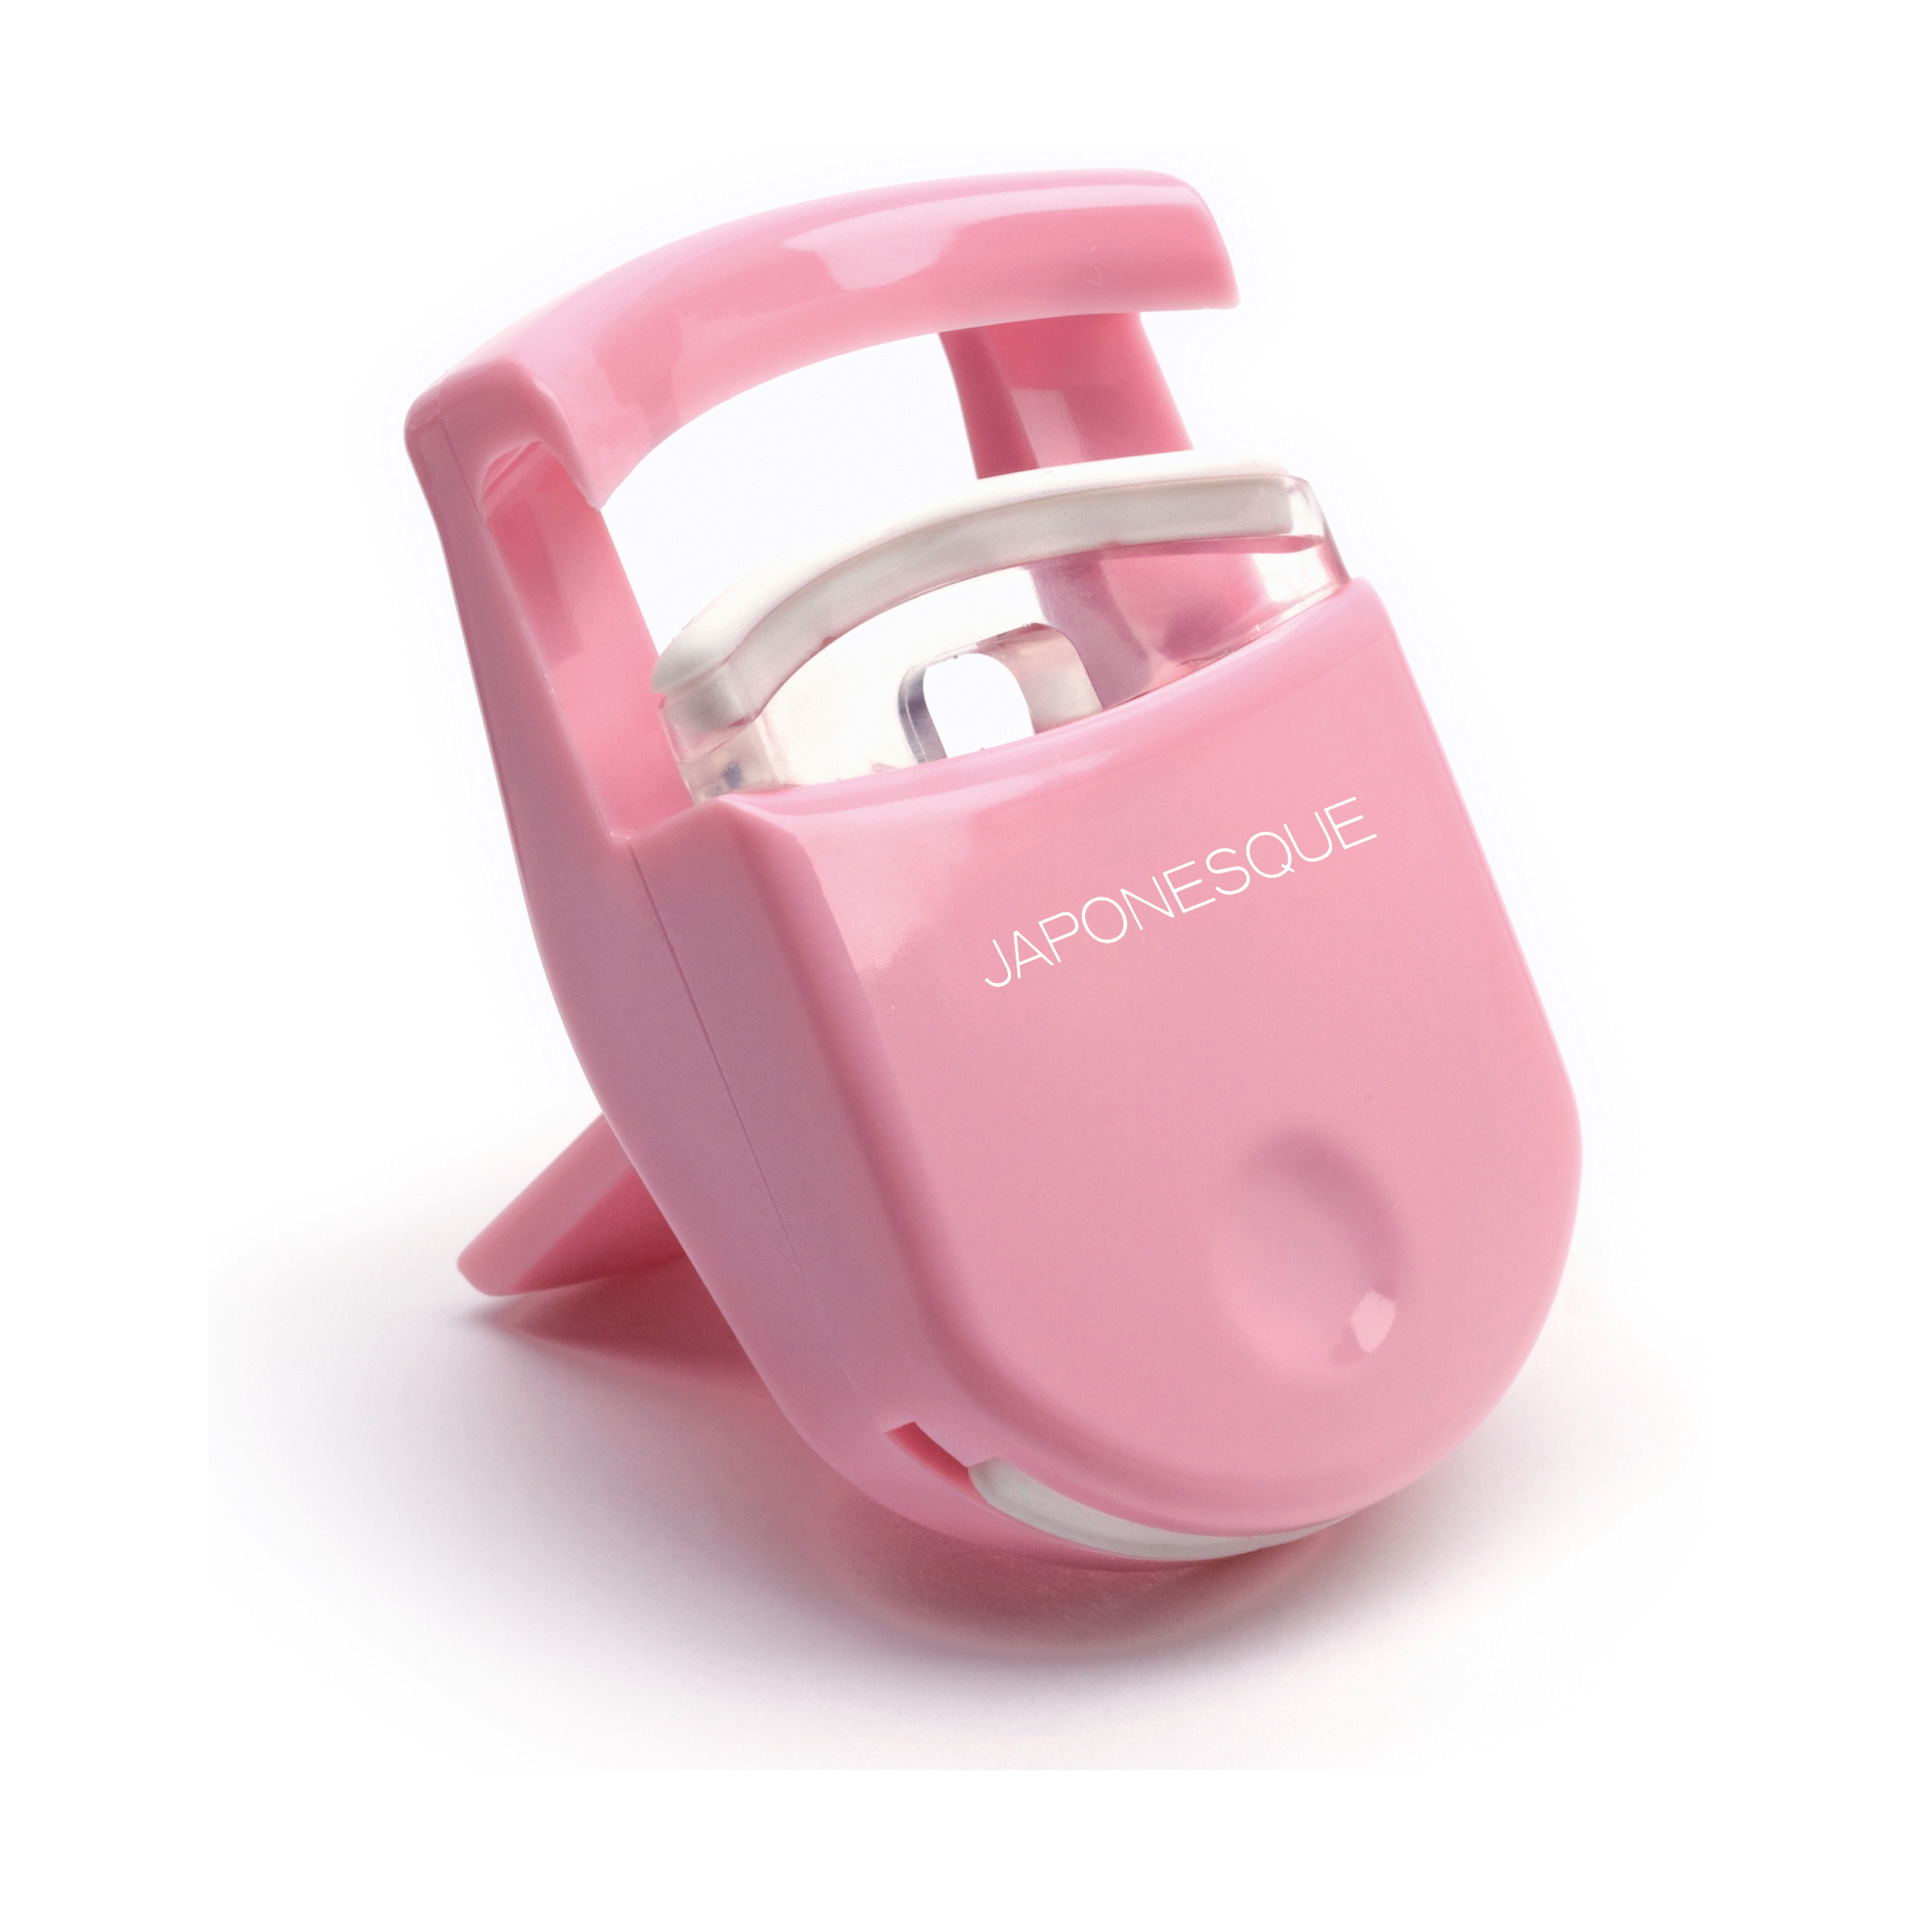 Go Curl Pocket Lash Curler Japonesque